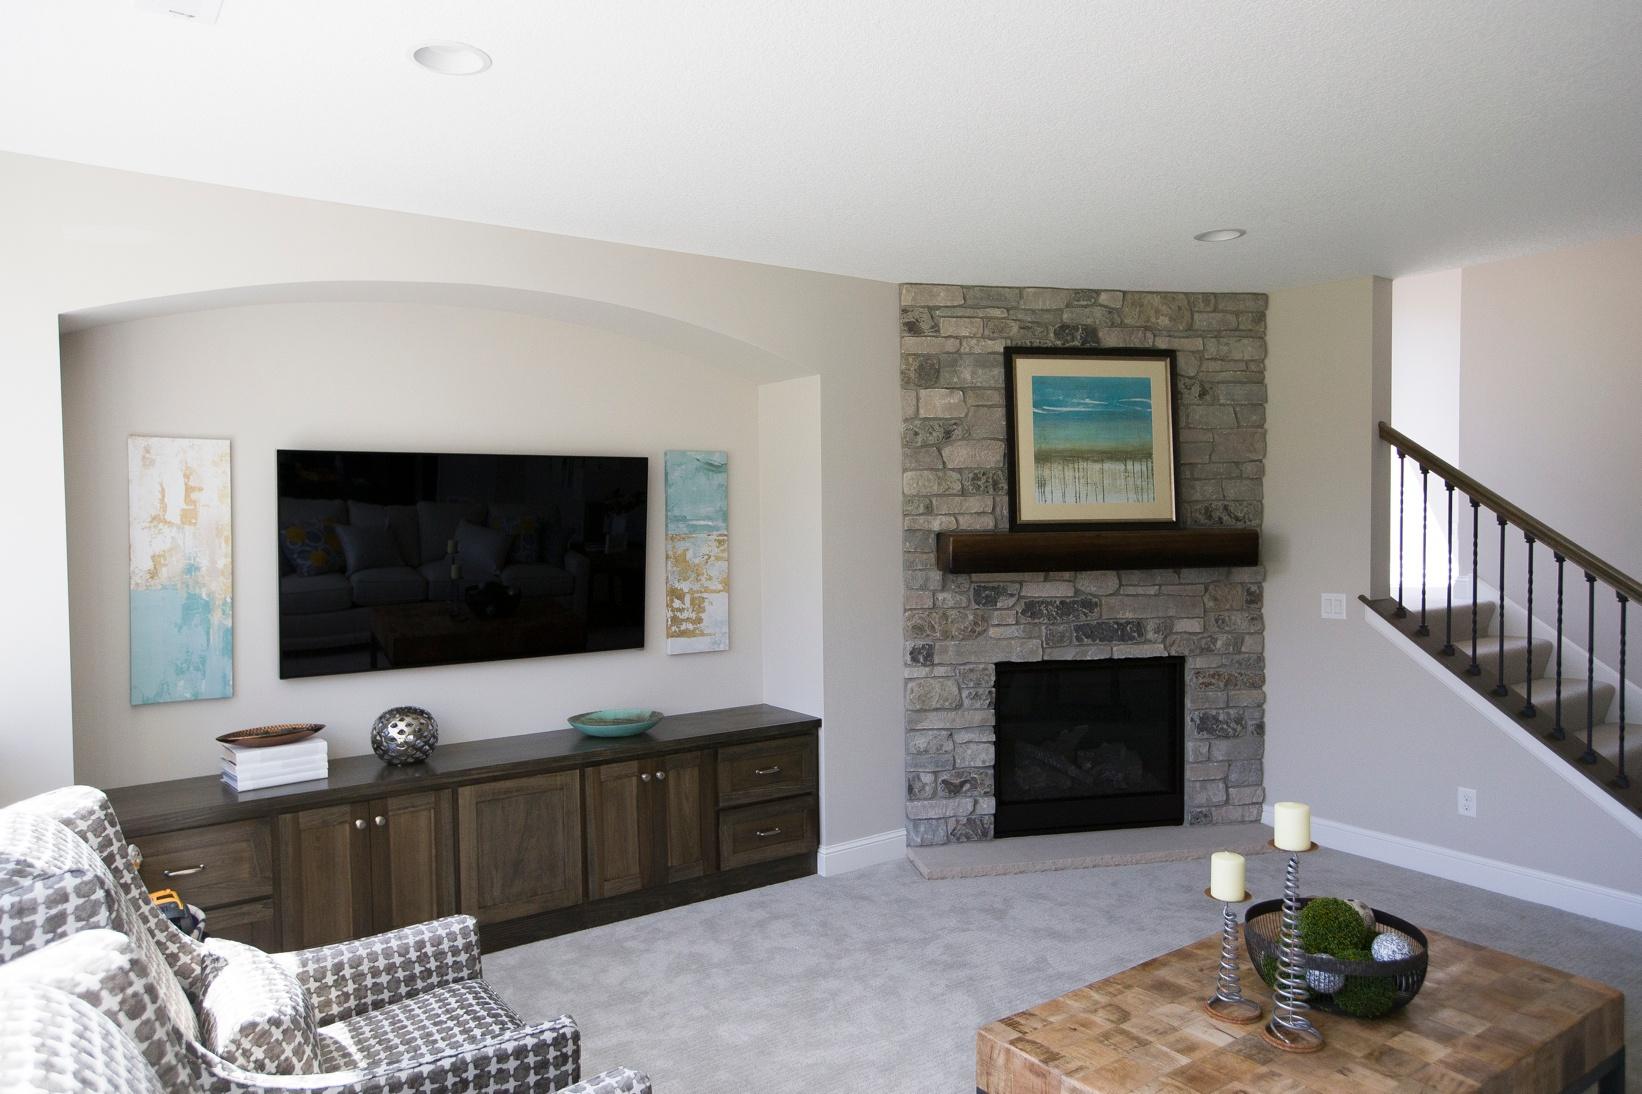 TV next to fireplace